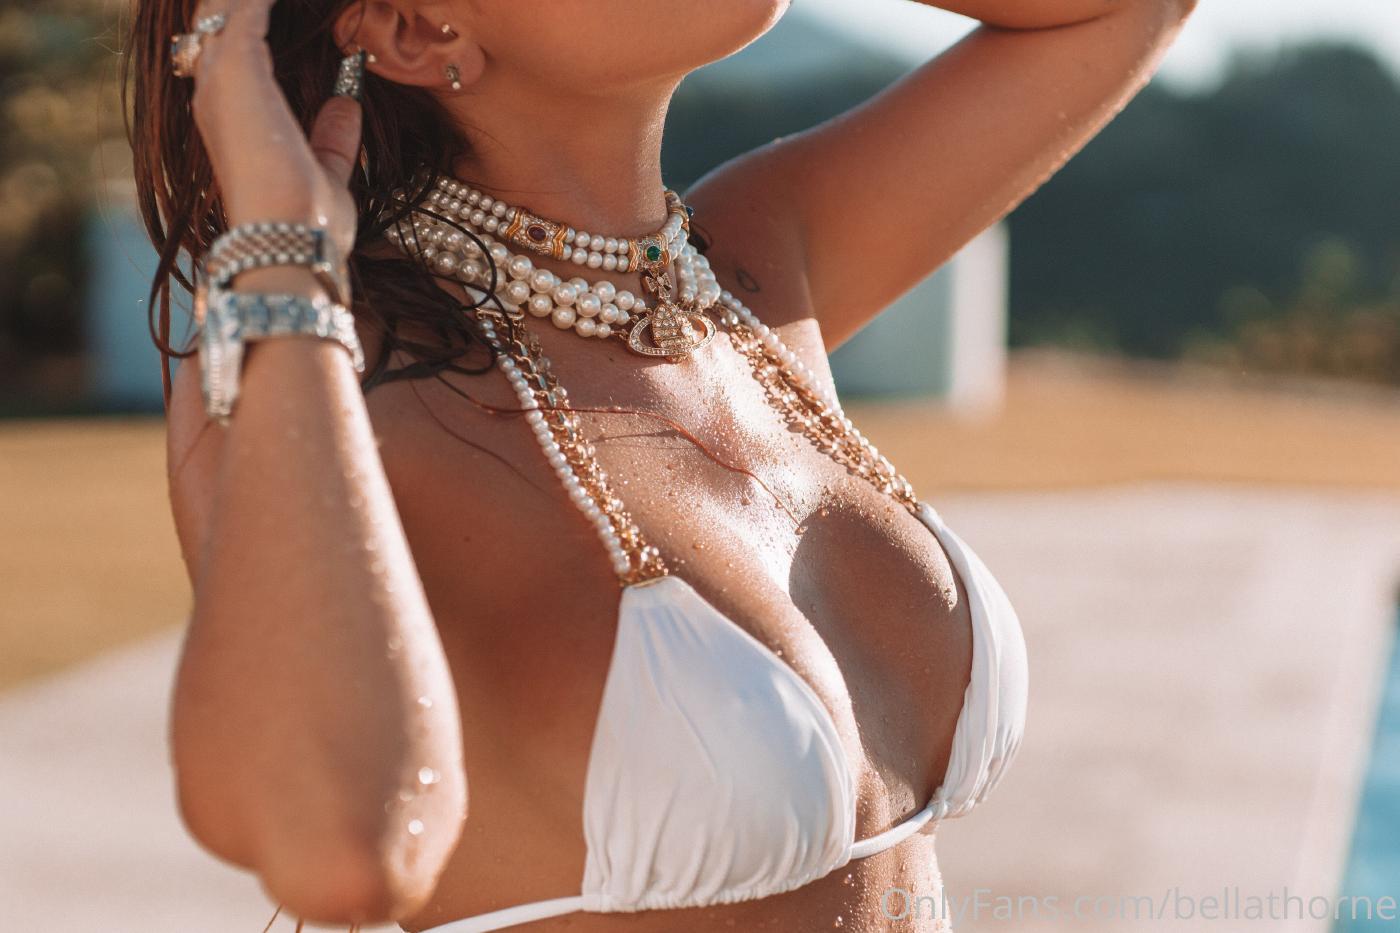 Bella Thorne Pool Bikini Onlyfans Set Leaked 0019